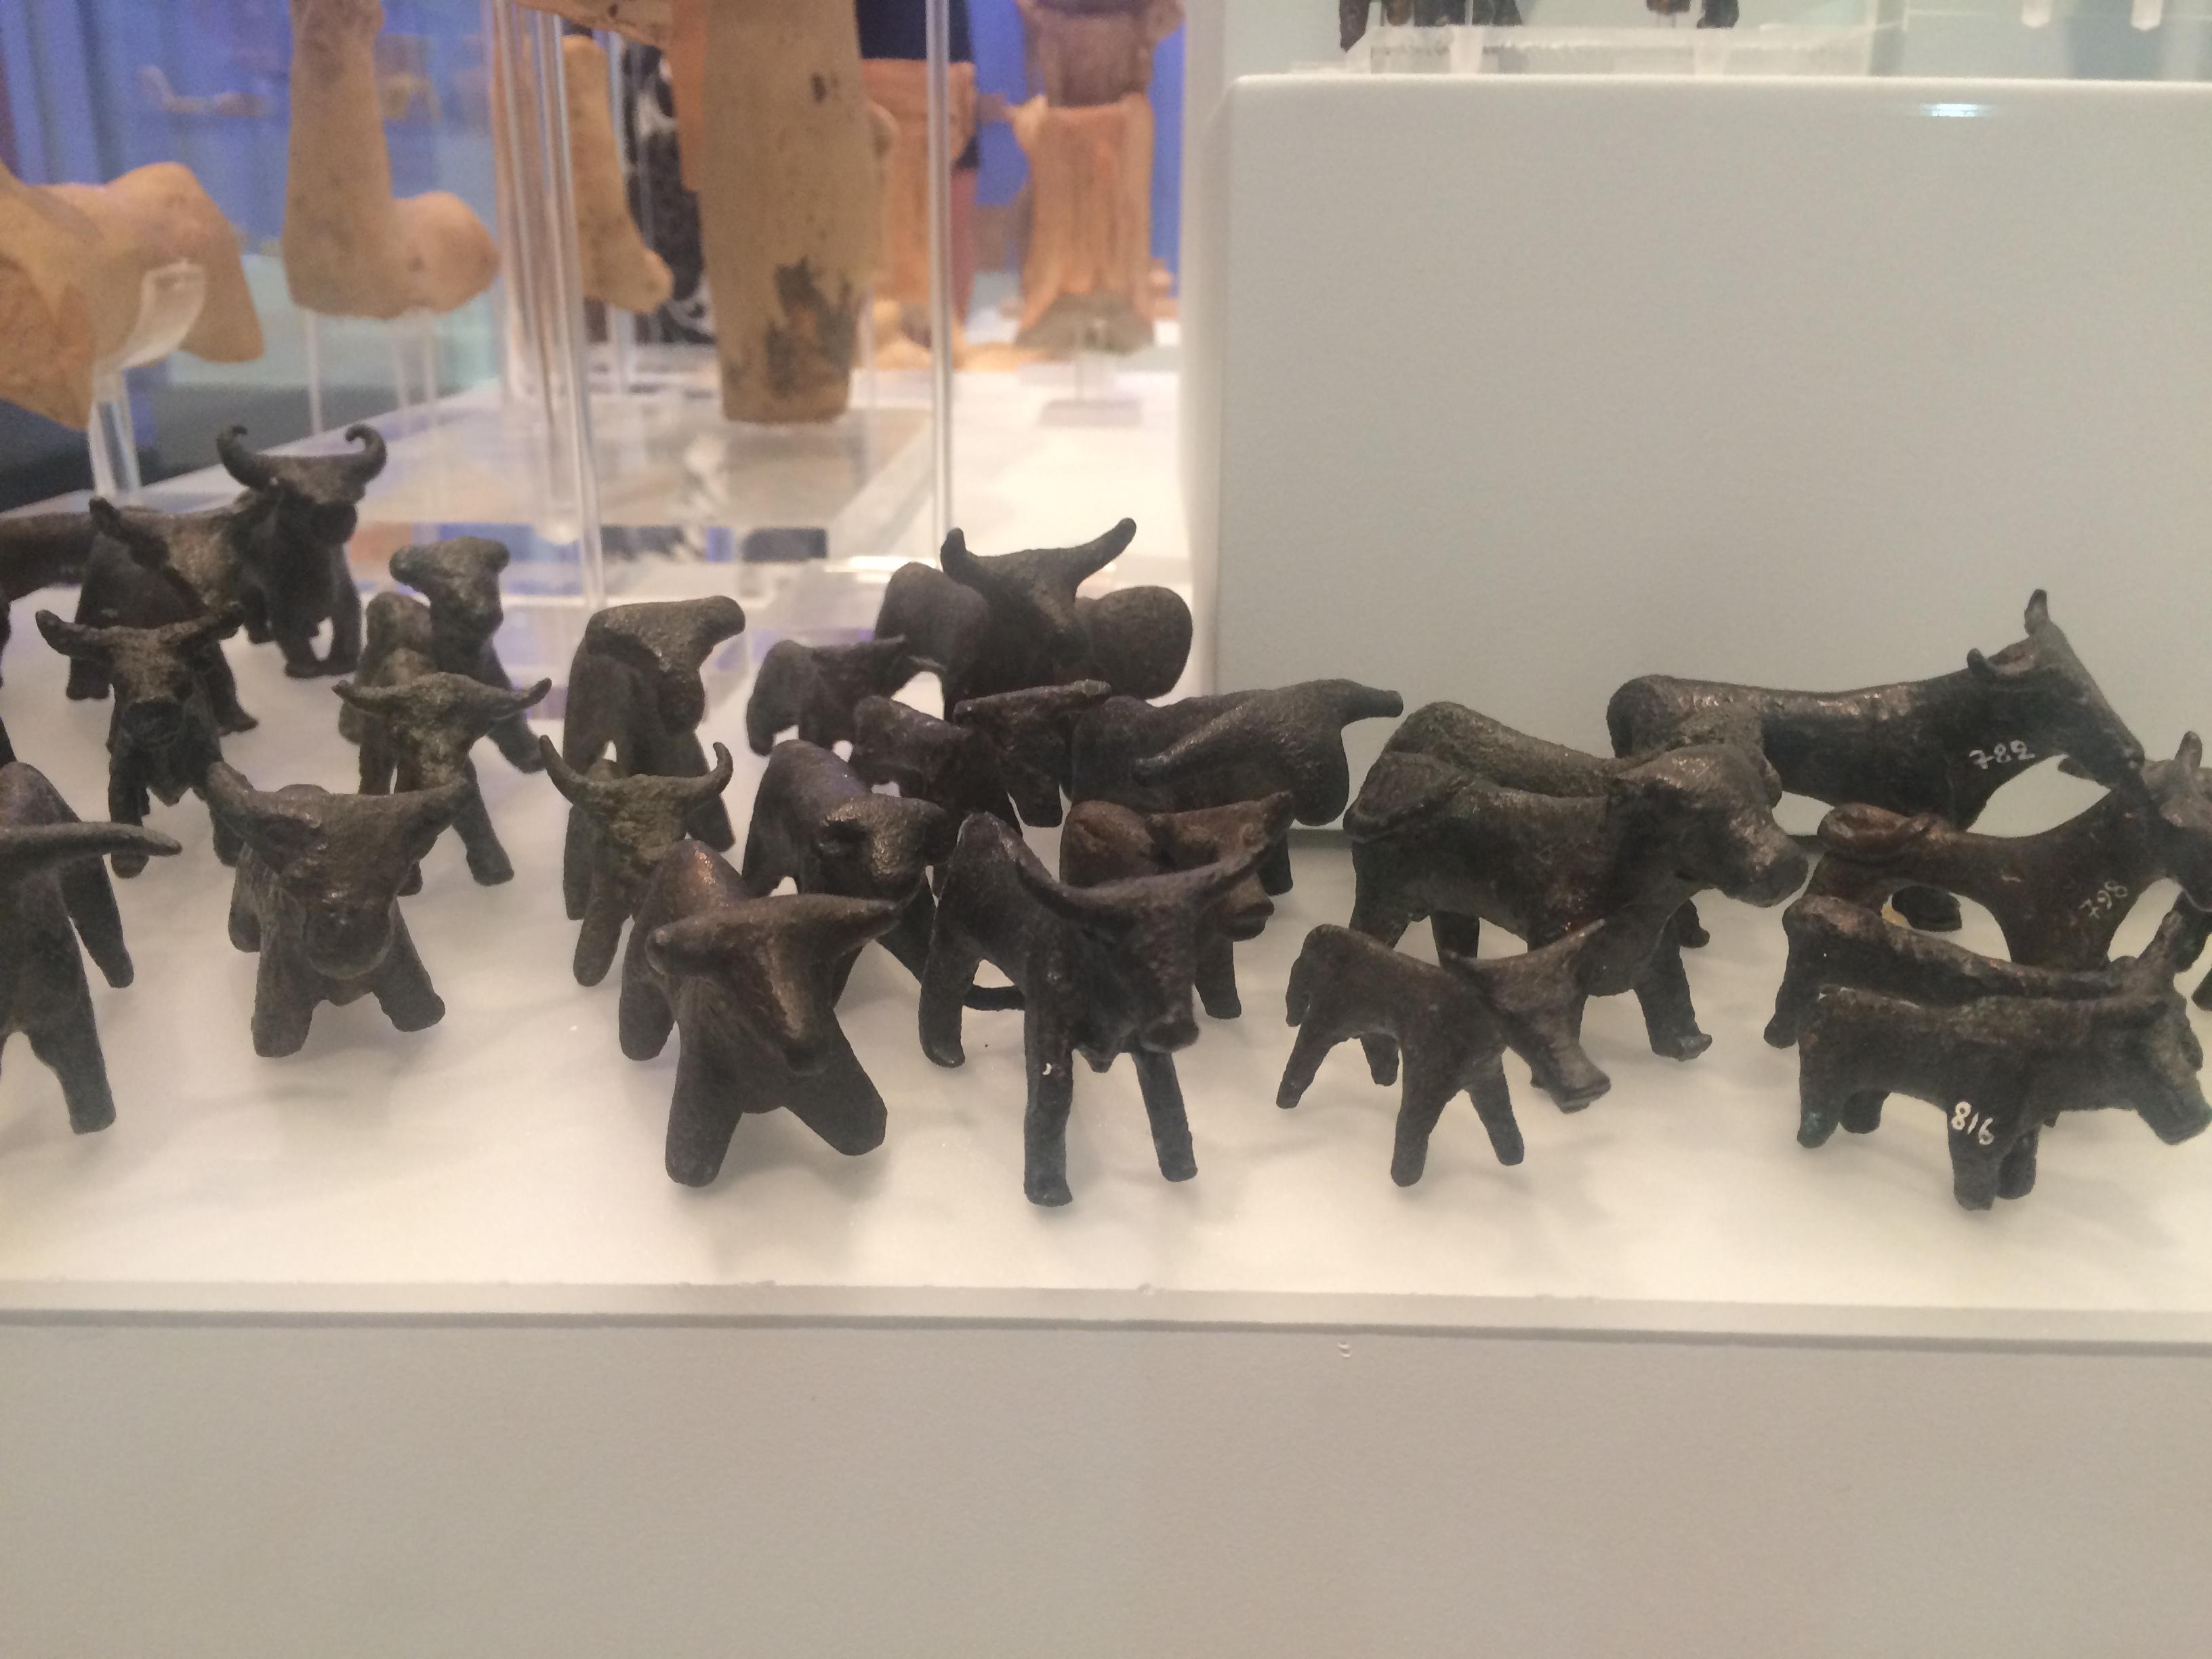 Minoan art - pottery bulls